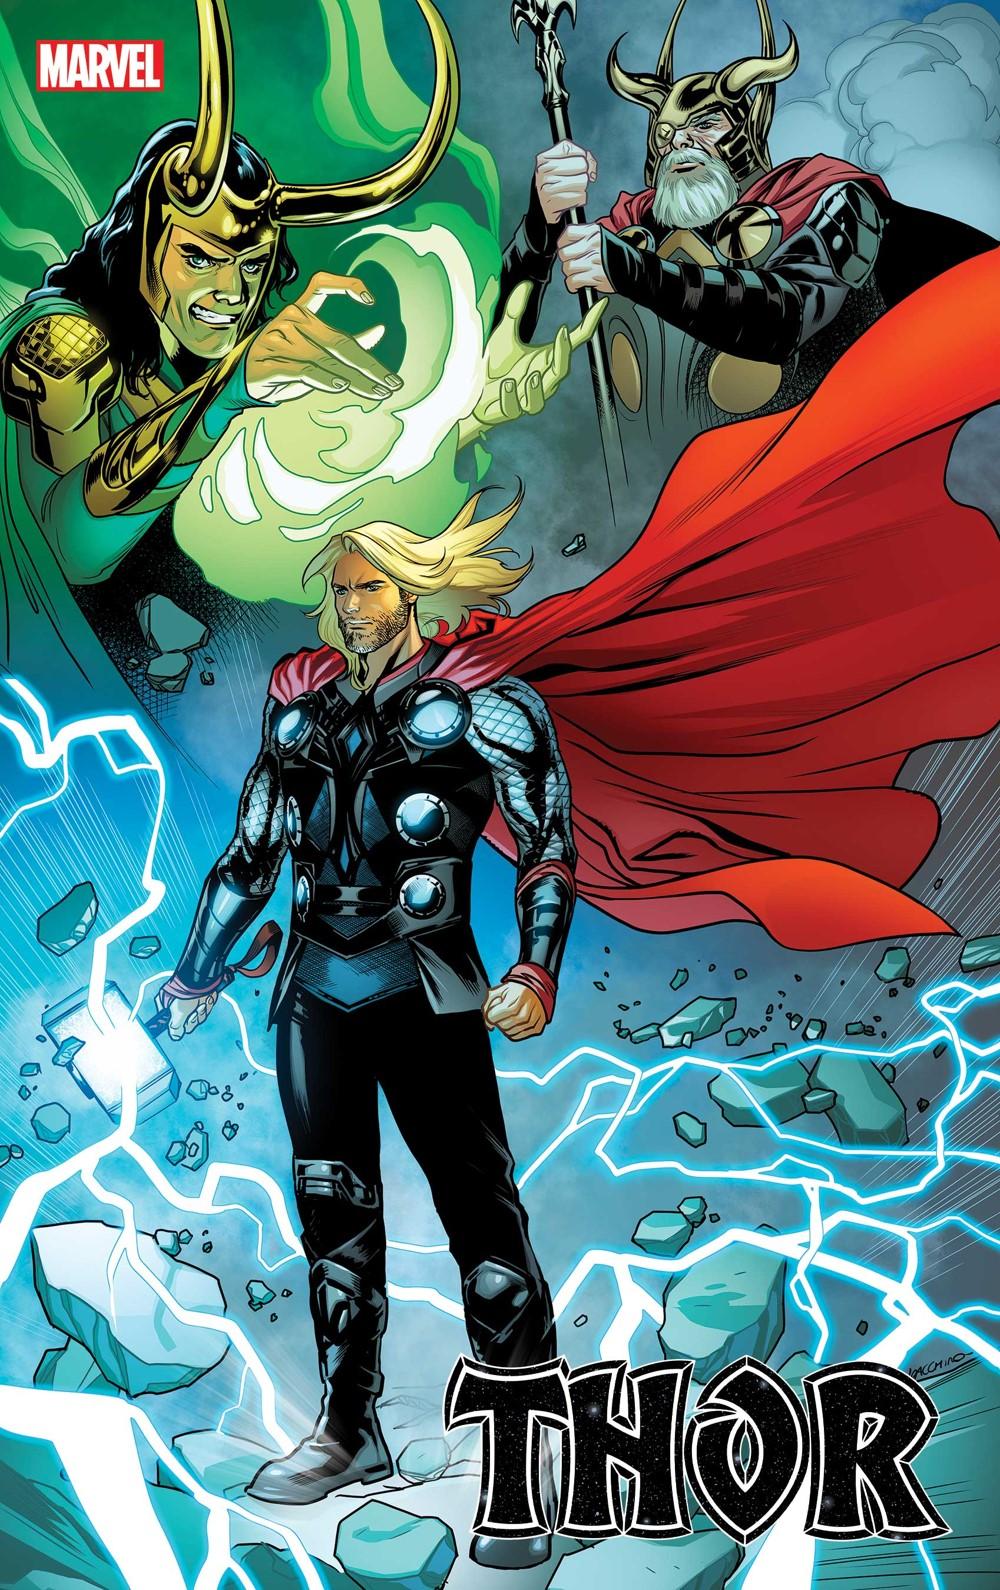 THOR_19_IS_VAR Marvel Comics November 2021 Solicitations